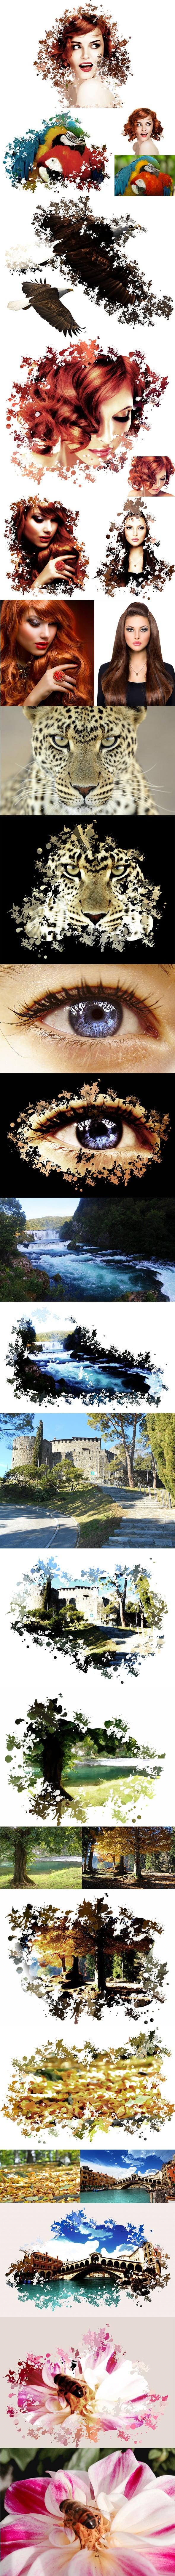 63 VSCO Photoshop Actions: Artistic Actions Bundle - just $9 - 5 2